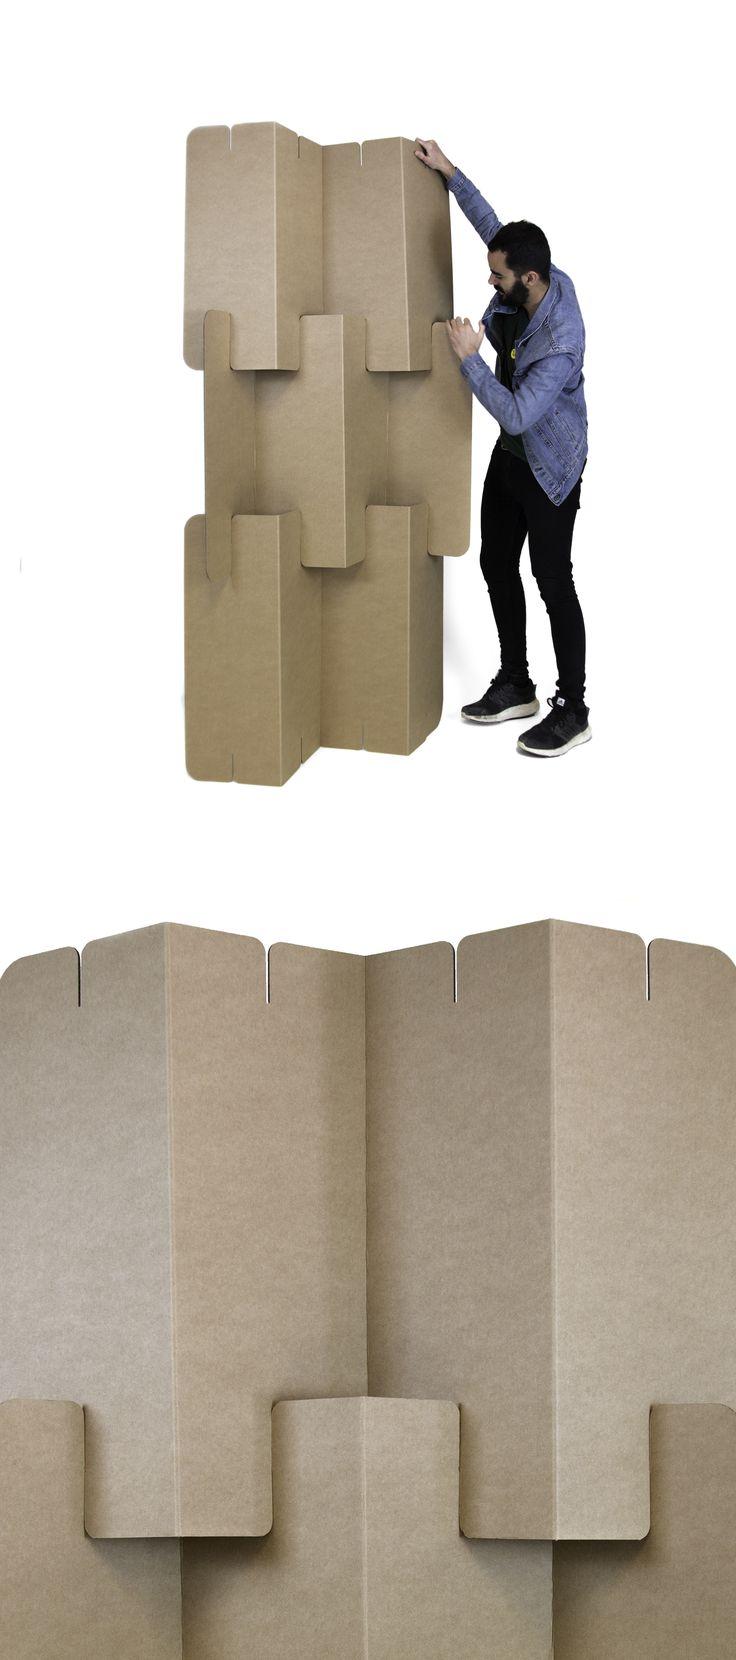 Biombo plegable zigzag furniture cardboard muebles de - Biombo de carton ...